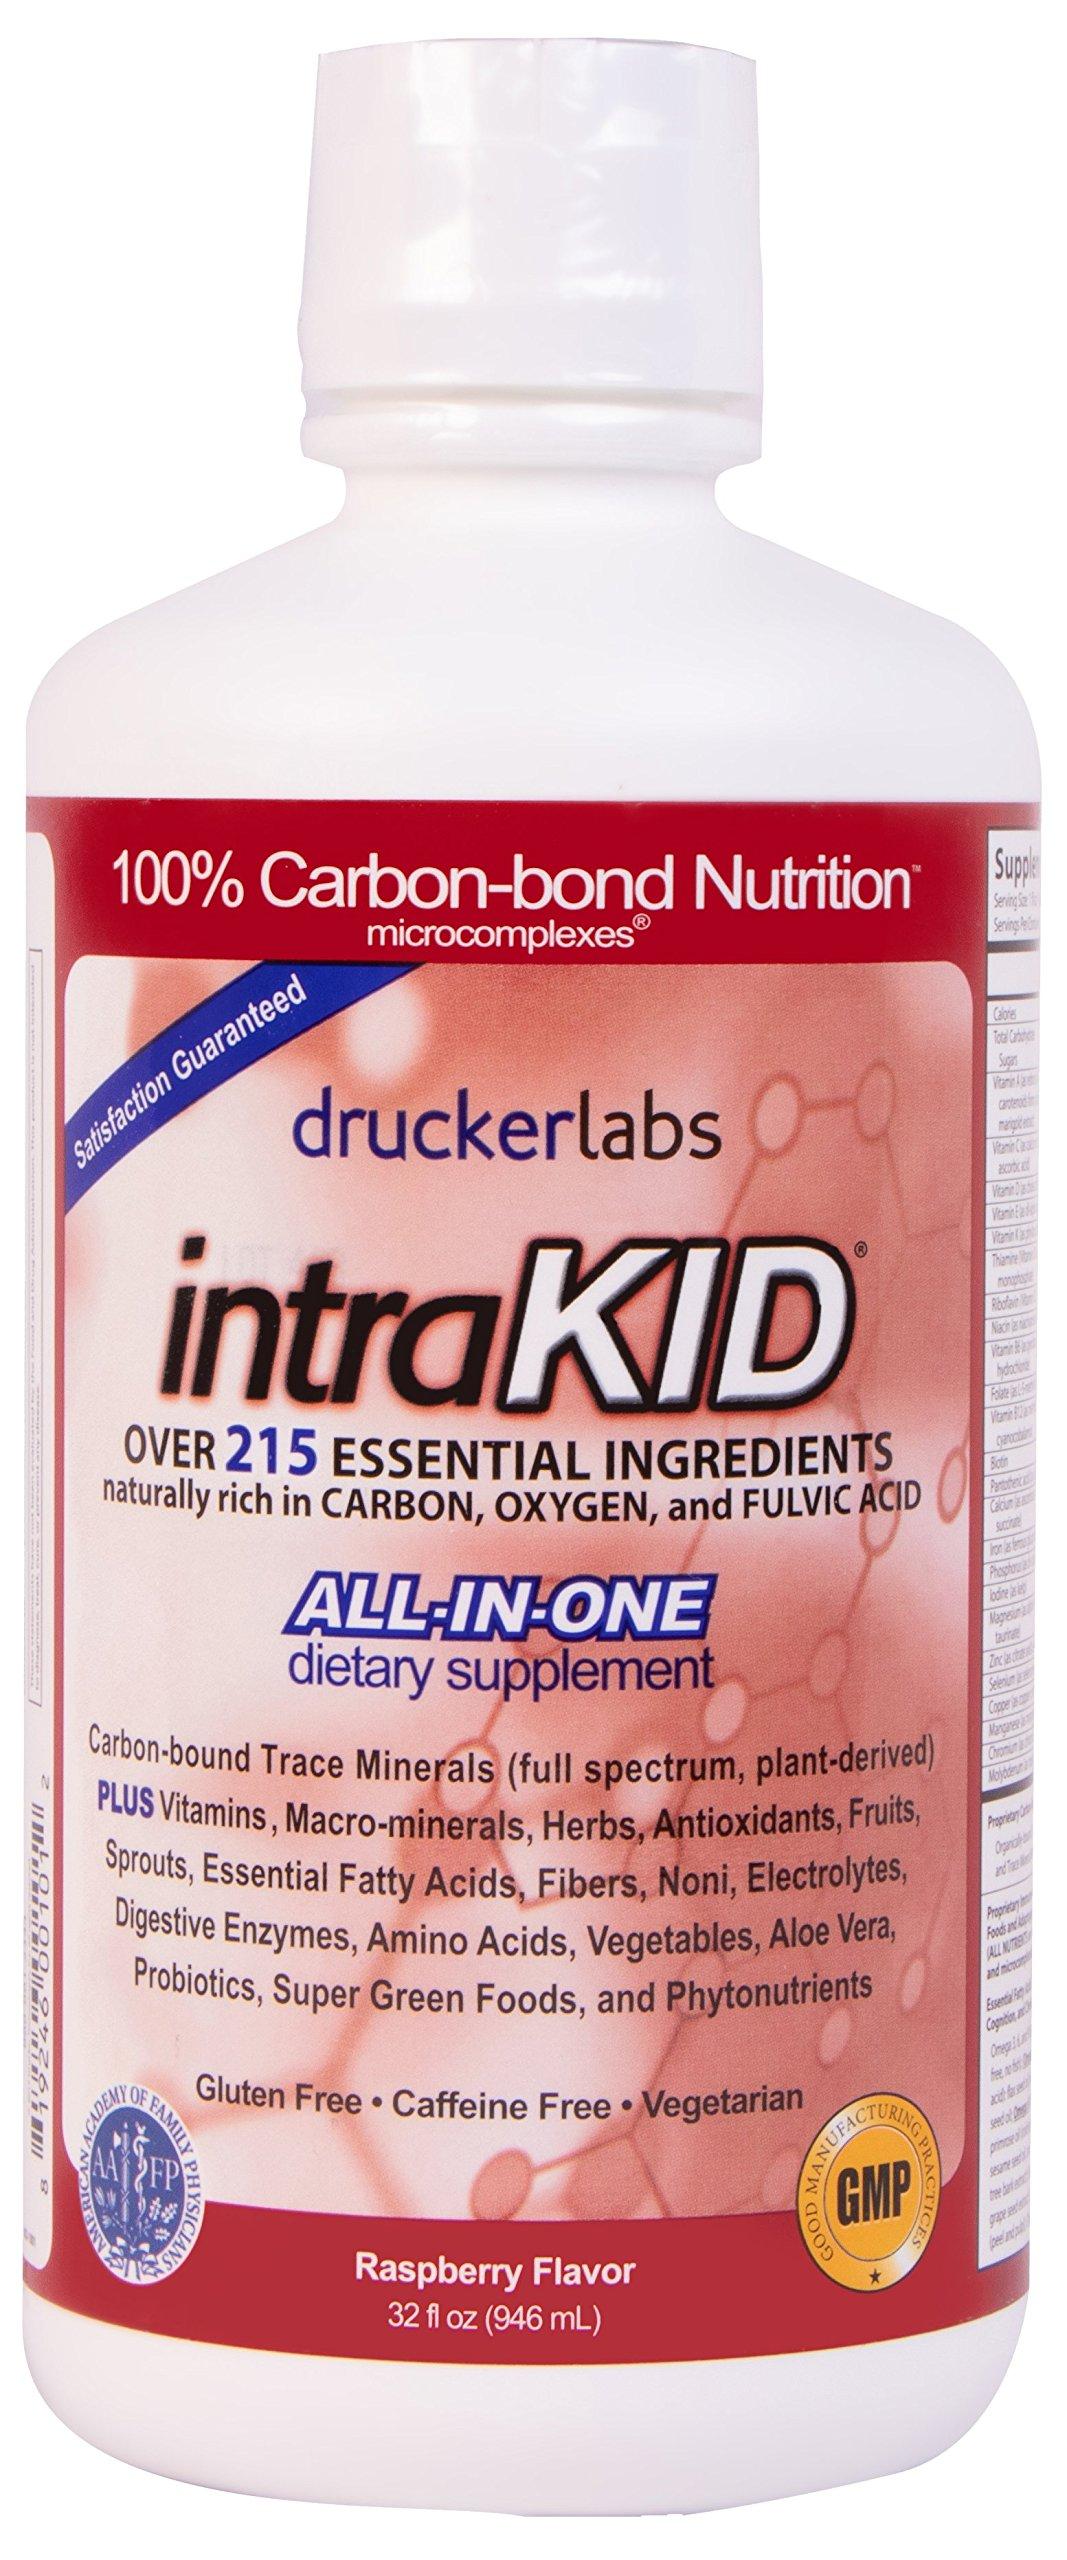 DRUCKER LABS IntraKID - Organic, Liquid, Trace Minerals, Multivitamin and Multi-Nutritional Dietary Supplement For Children  (32 Ounce / 946 Milliliter, Raspberry Flavor)